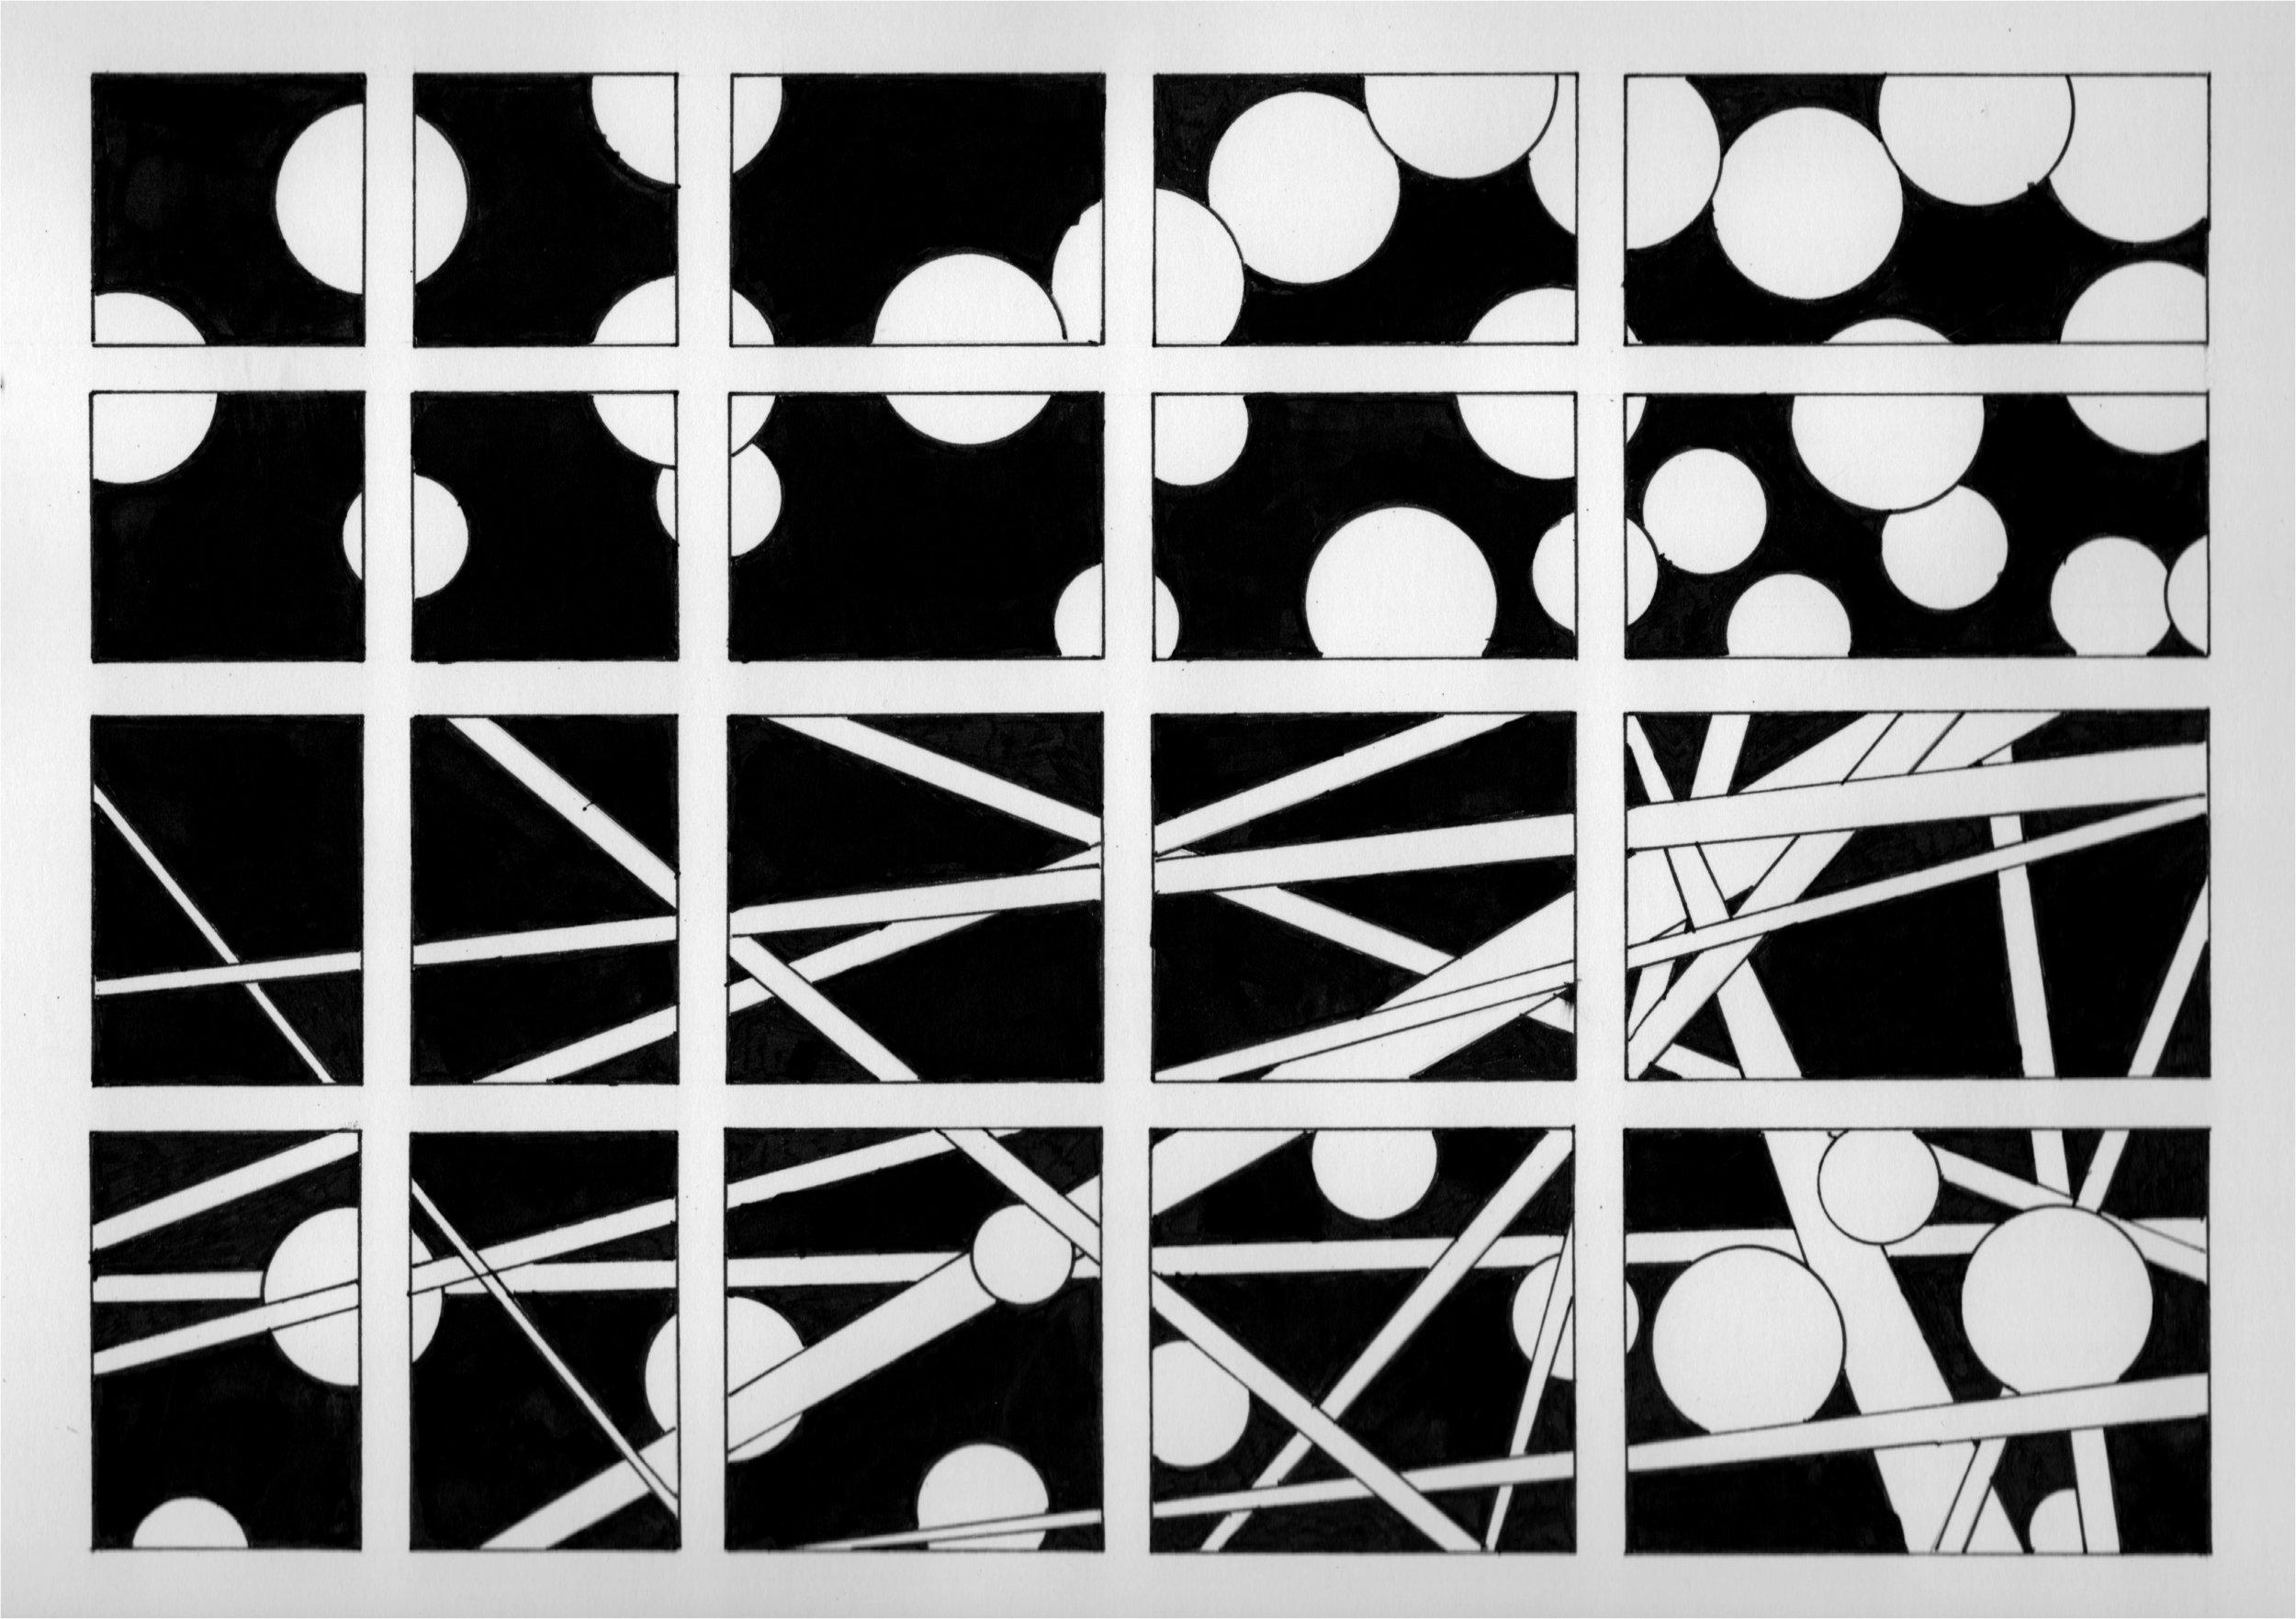 circlesandlines.jpg